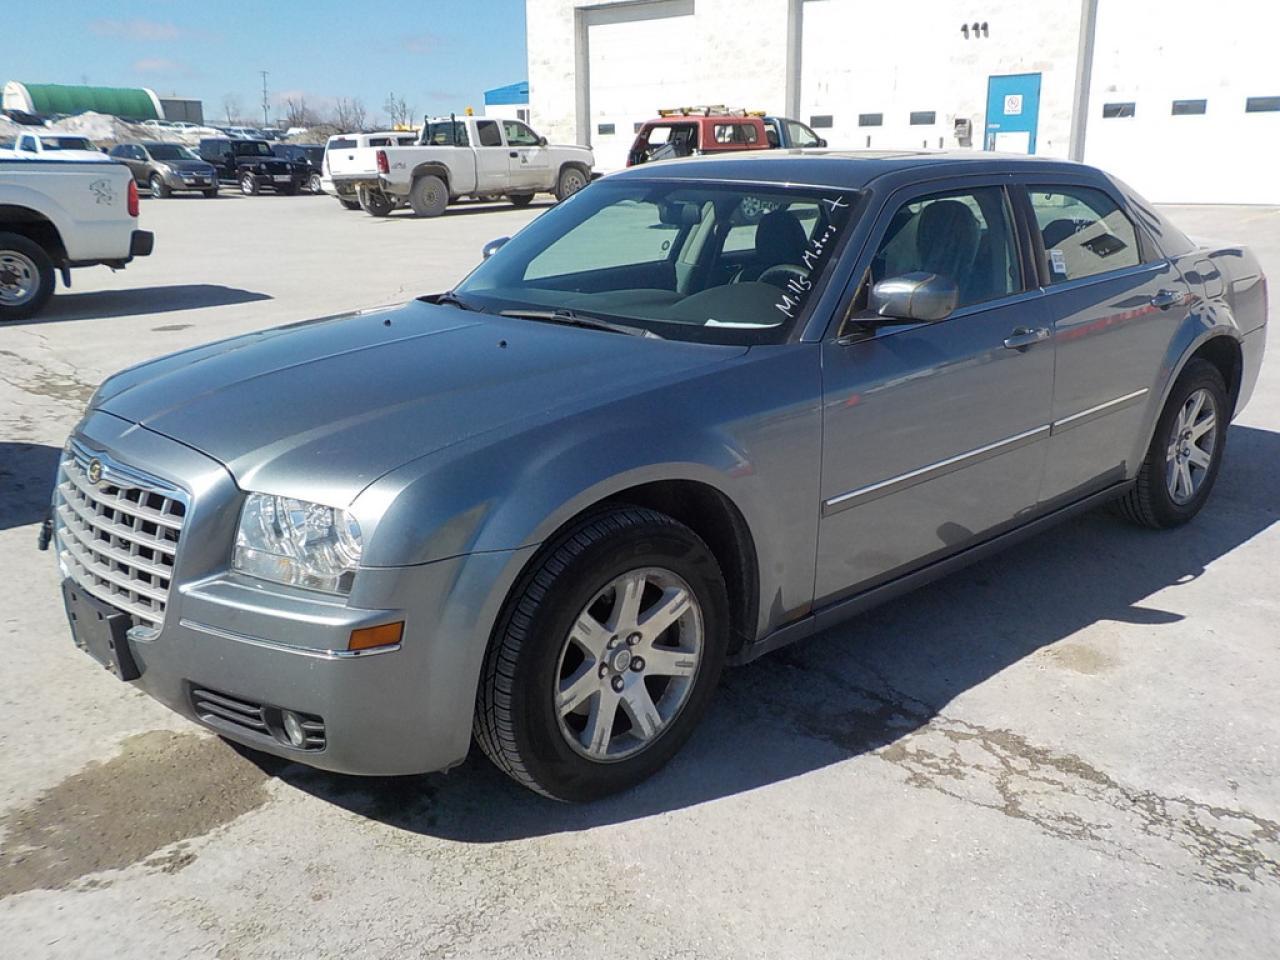 Photo of Grey 2006 Chrysler 300